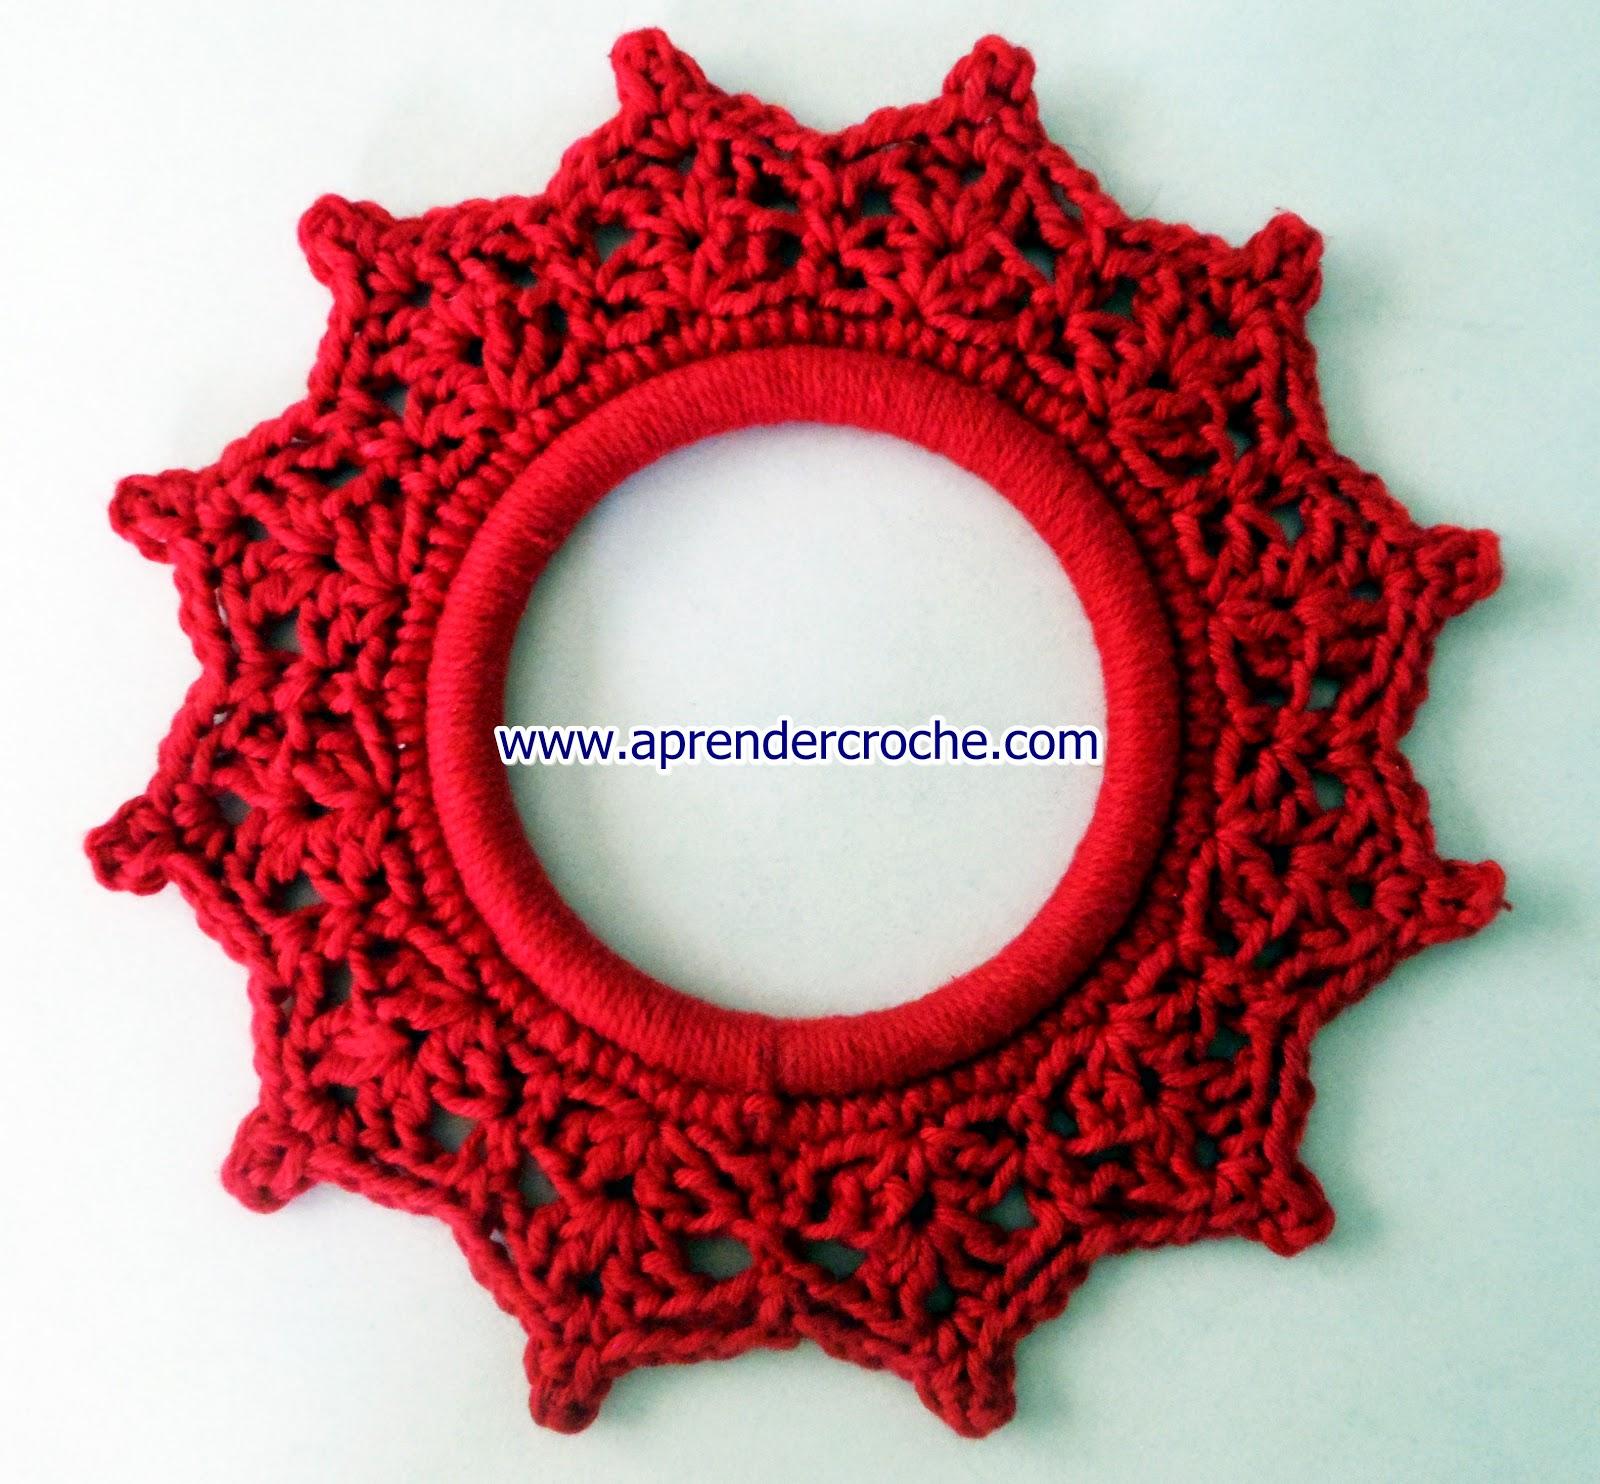 aprender croche natal guirlanda porta laços fitas edinir-croche dvd vermelho maxcolor barroco circulo loja frete gratis youtube